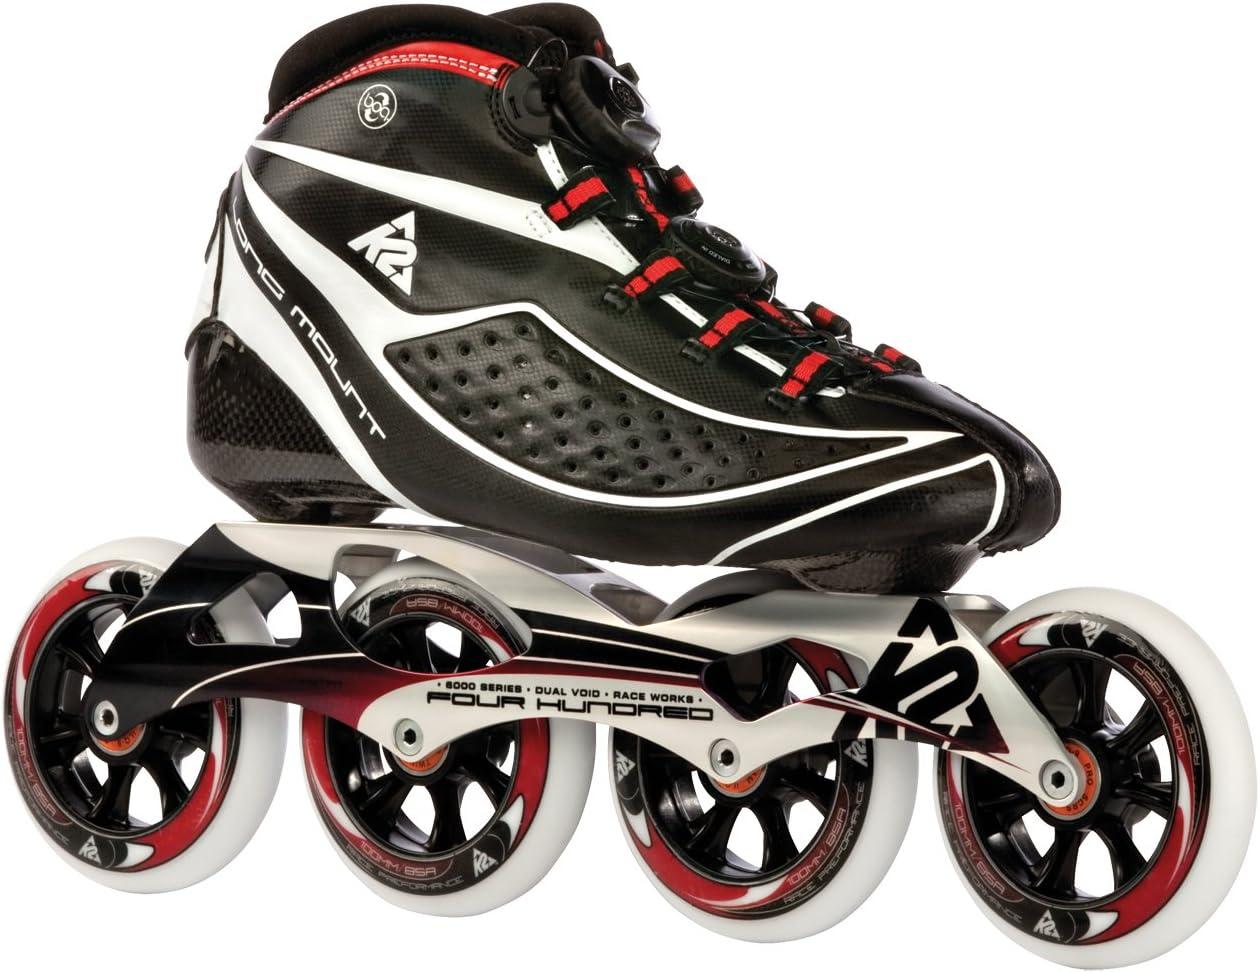 K2 Pro Longmount Inline Skates